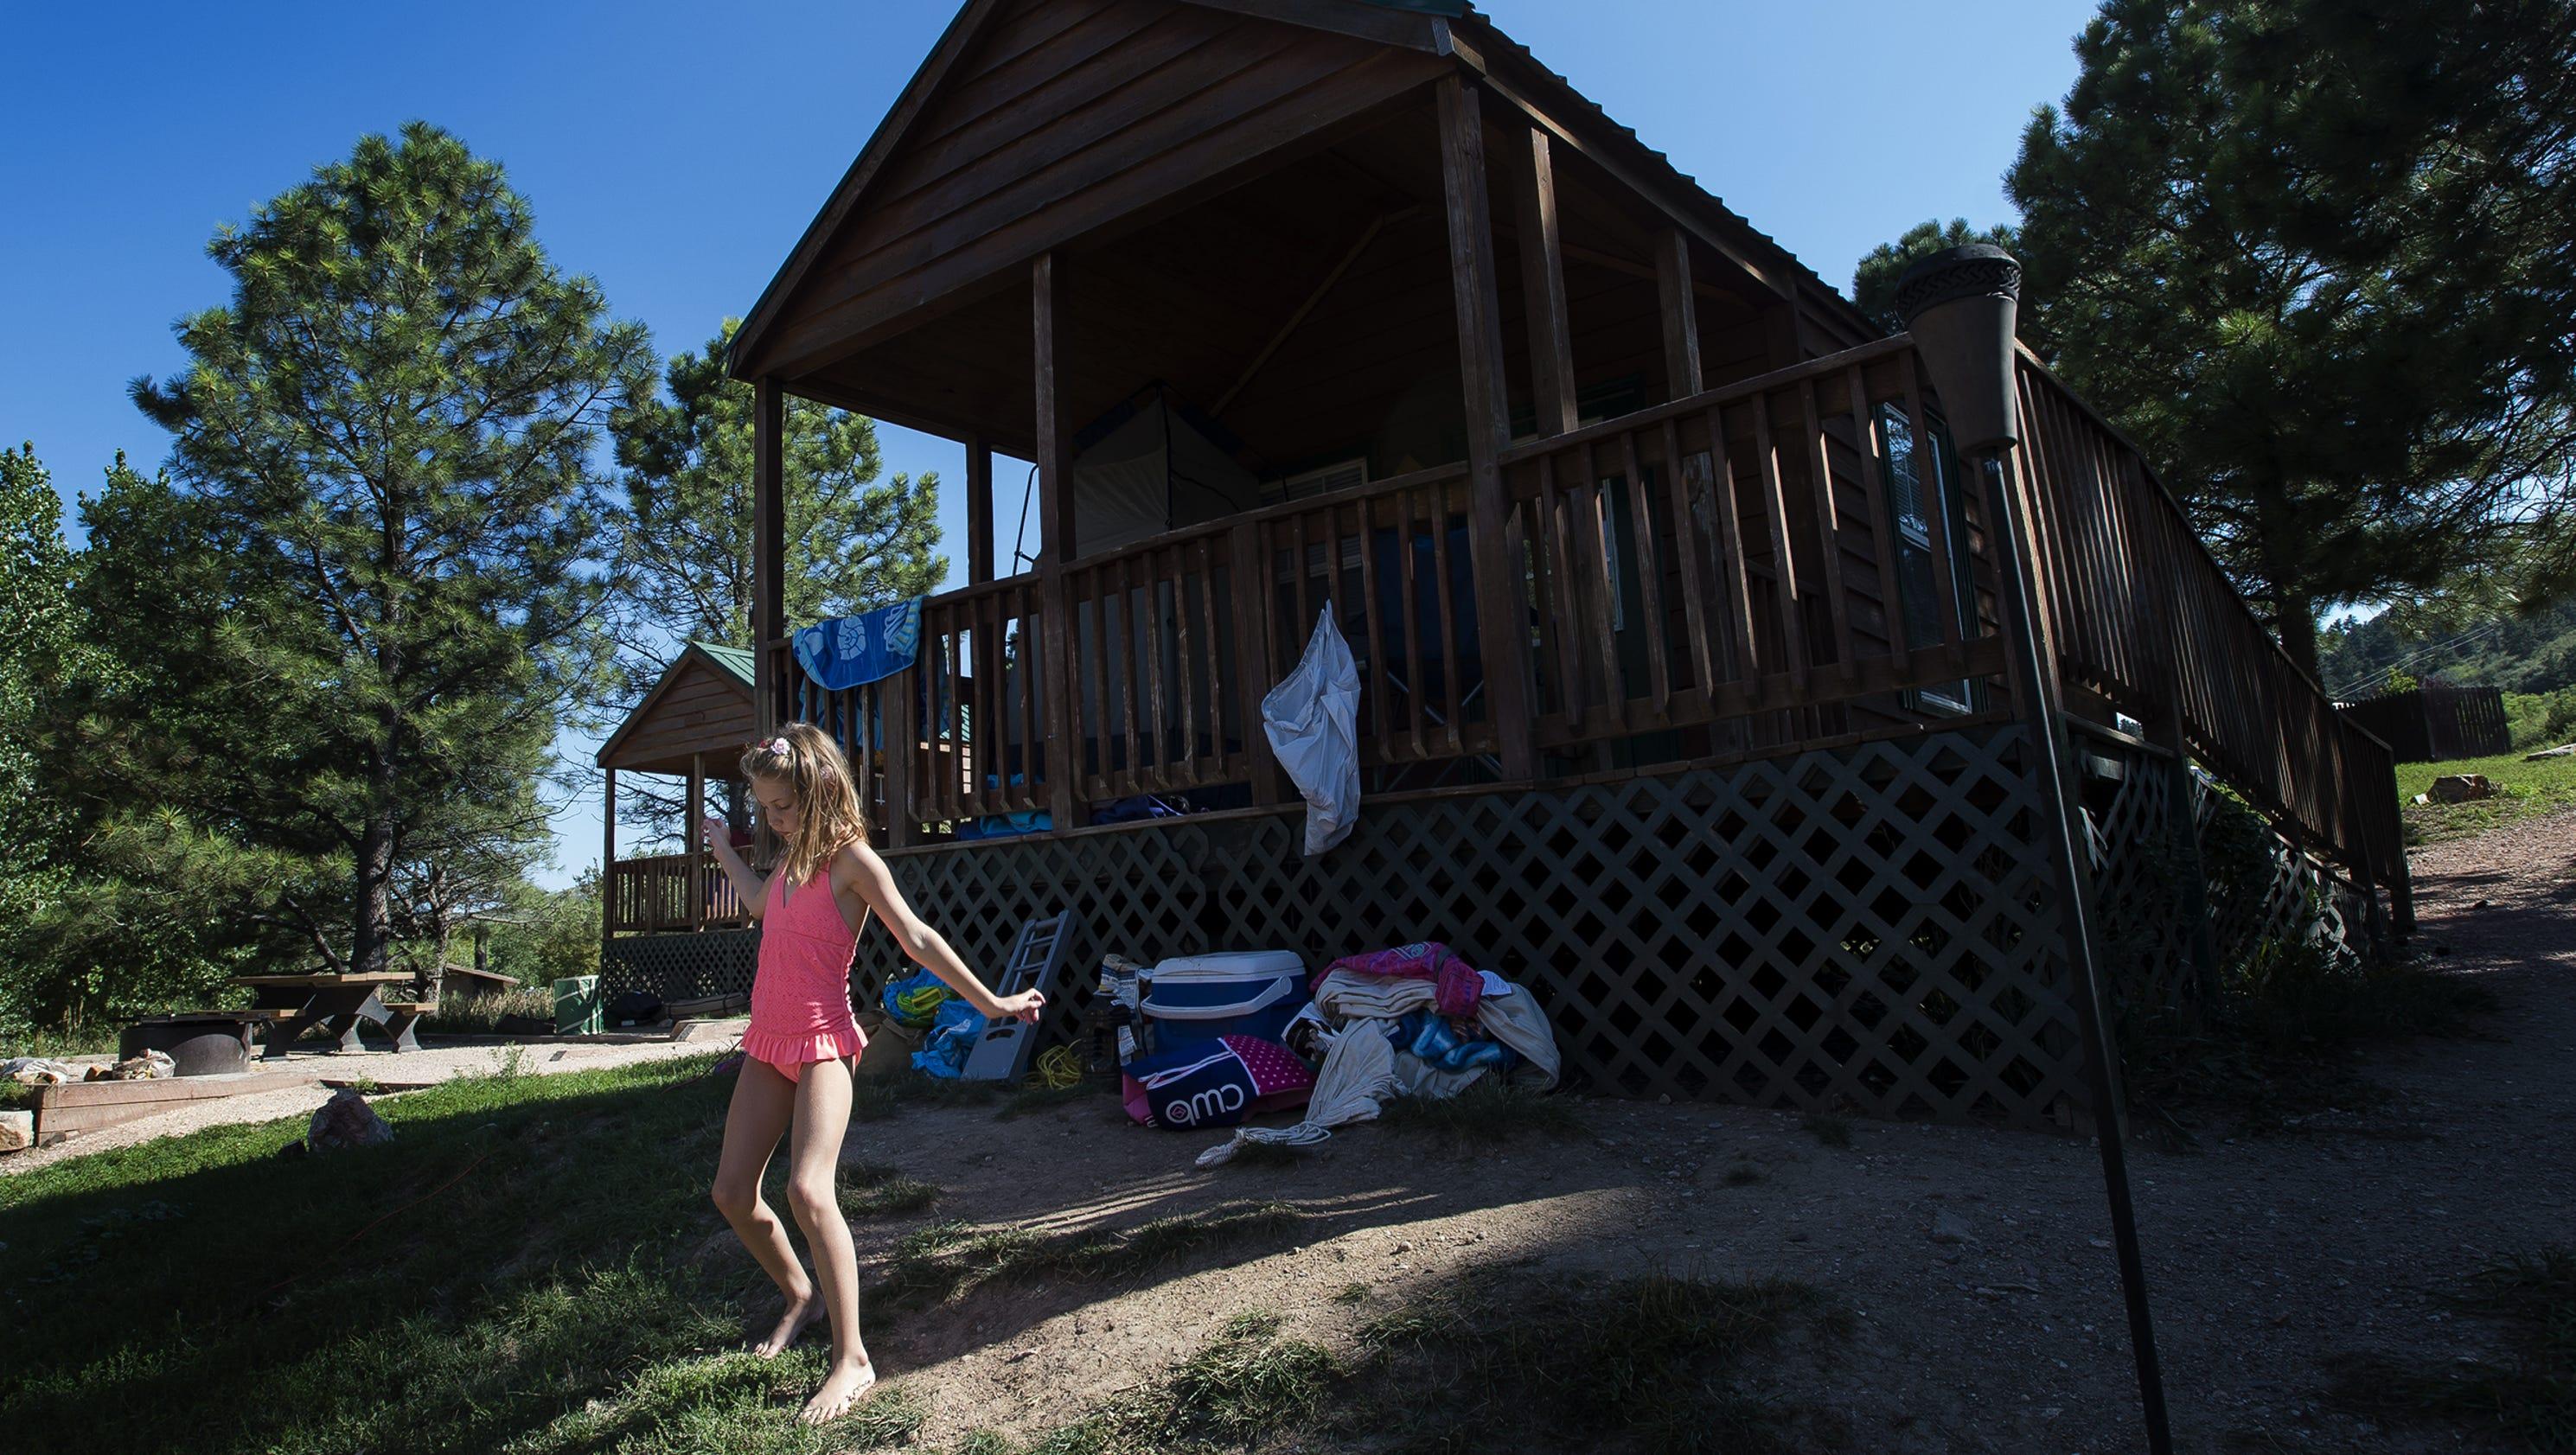 Northern colorado 39 s guide to glamping in northern colorado for Cabin rentals near fort collins colorado